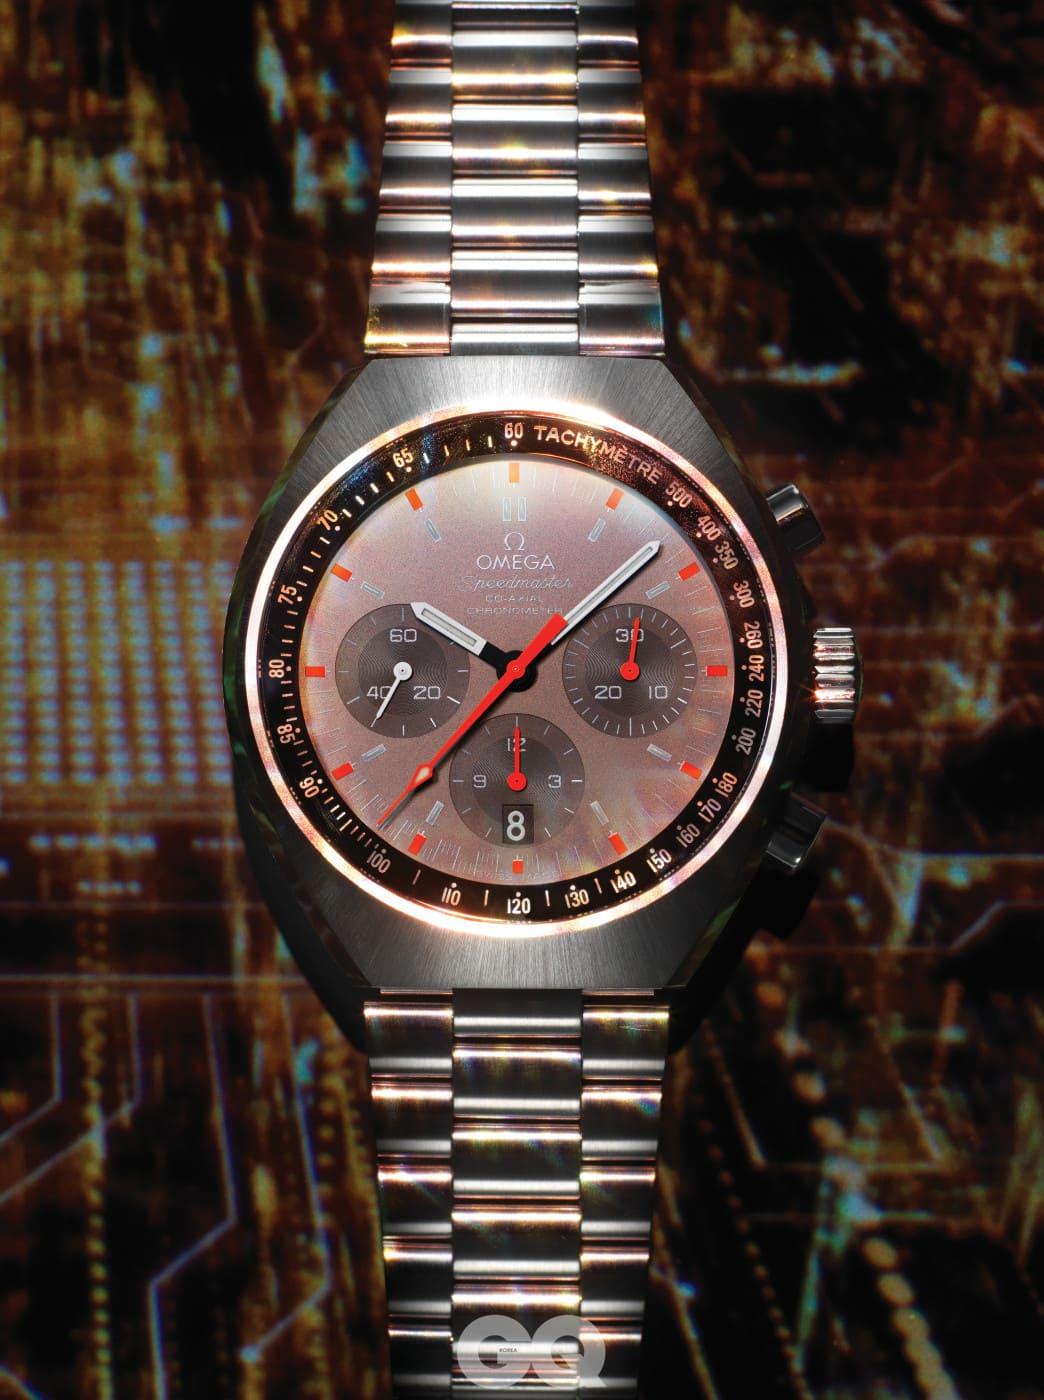 180712 GQ(watch)_6877